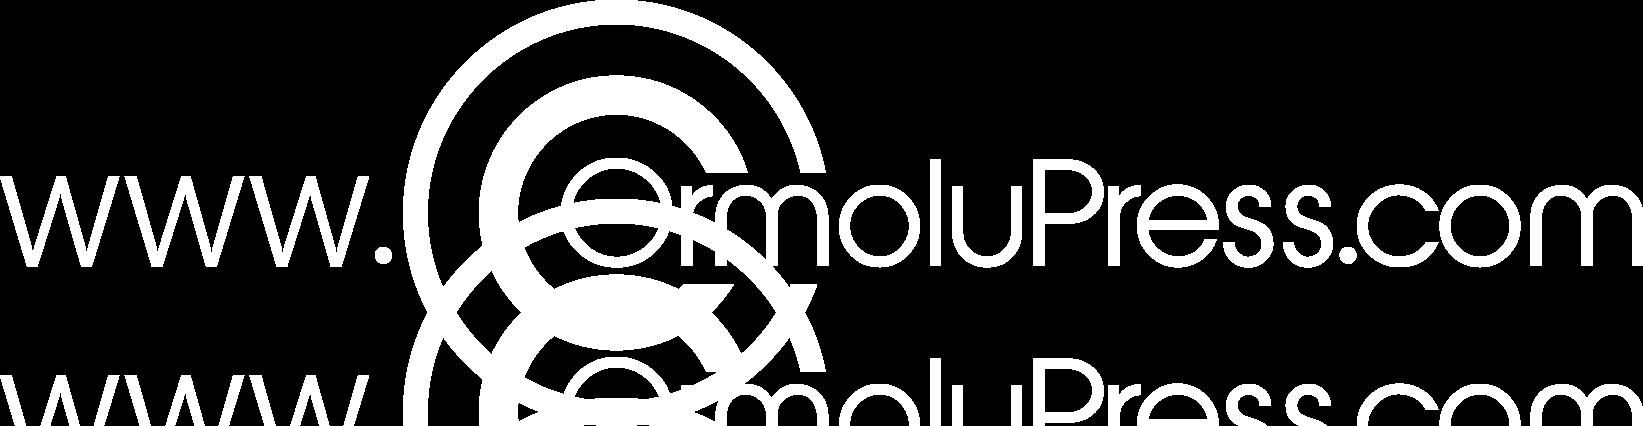 Copyright-Ormolu-Press-3